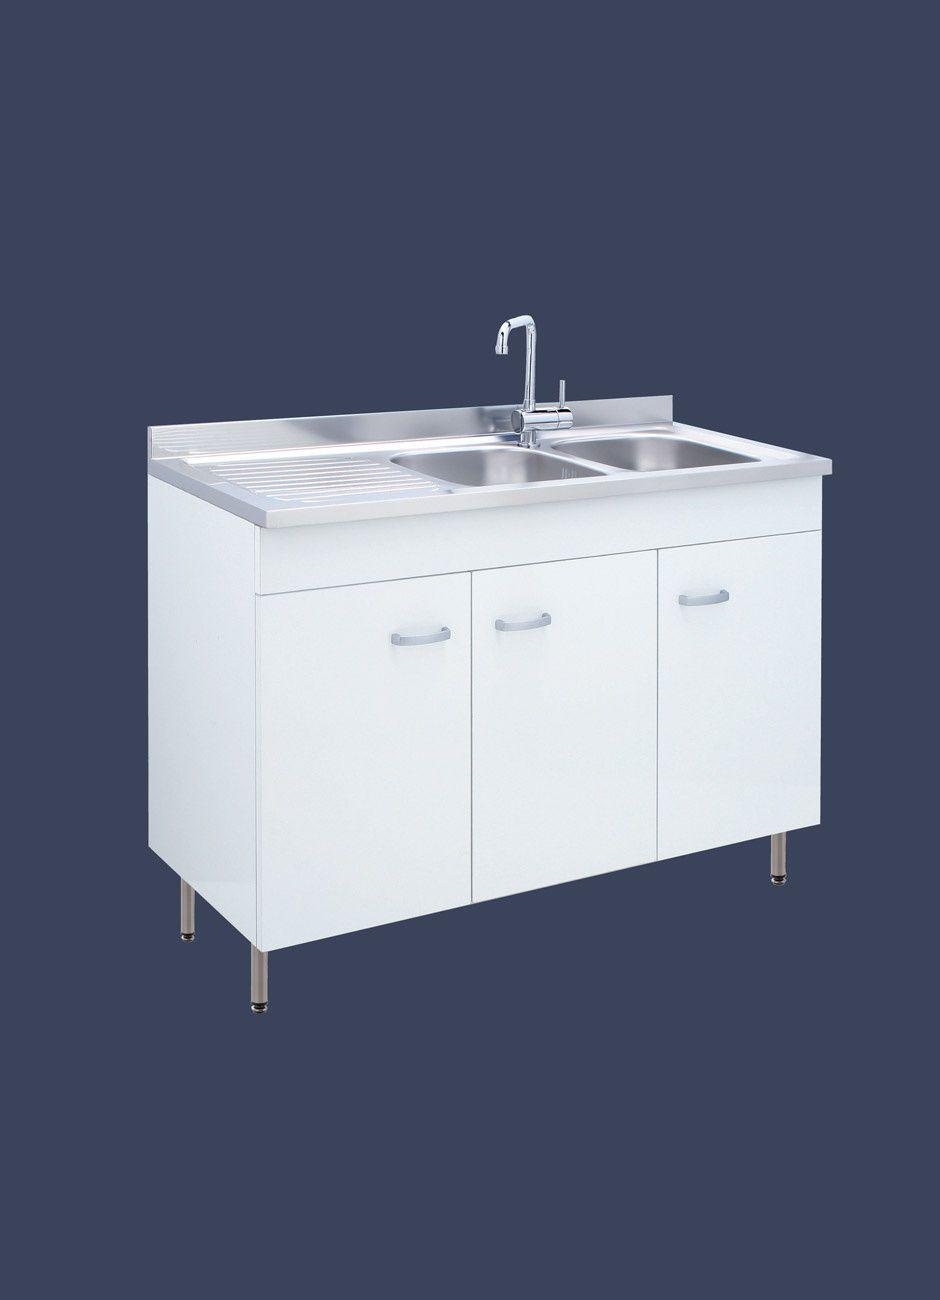 Mueble para fregadero de acero inoxidable - SOFIA - LMC srl